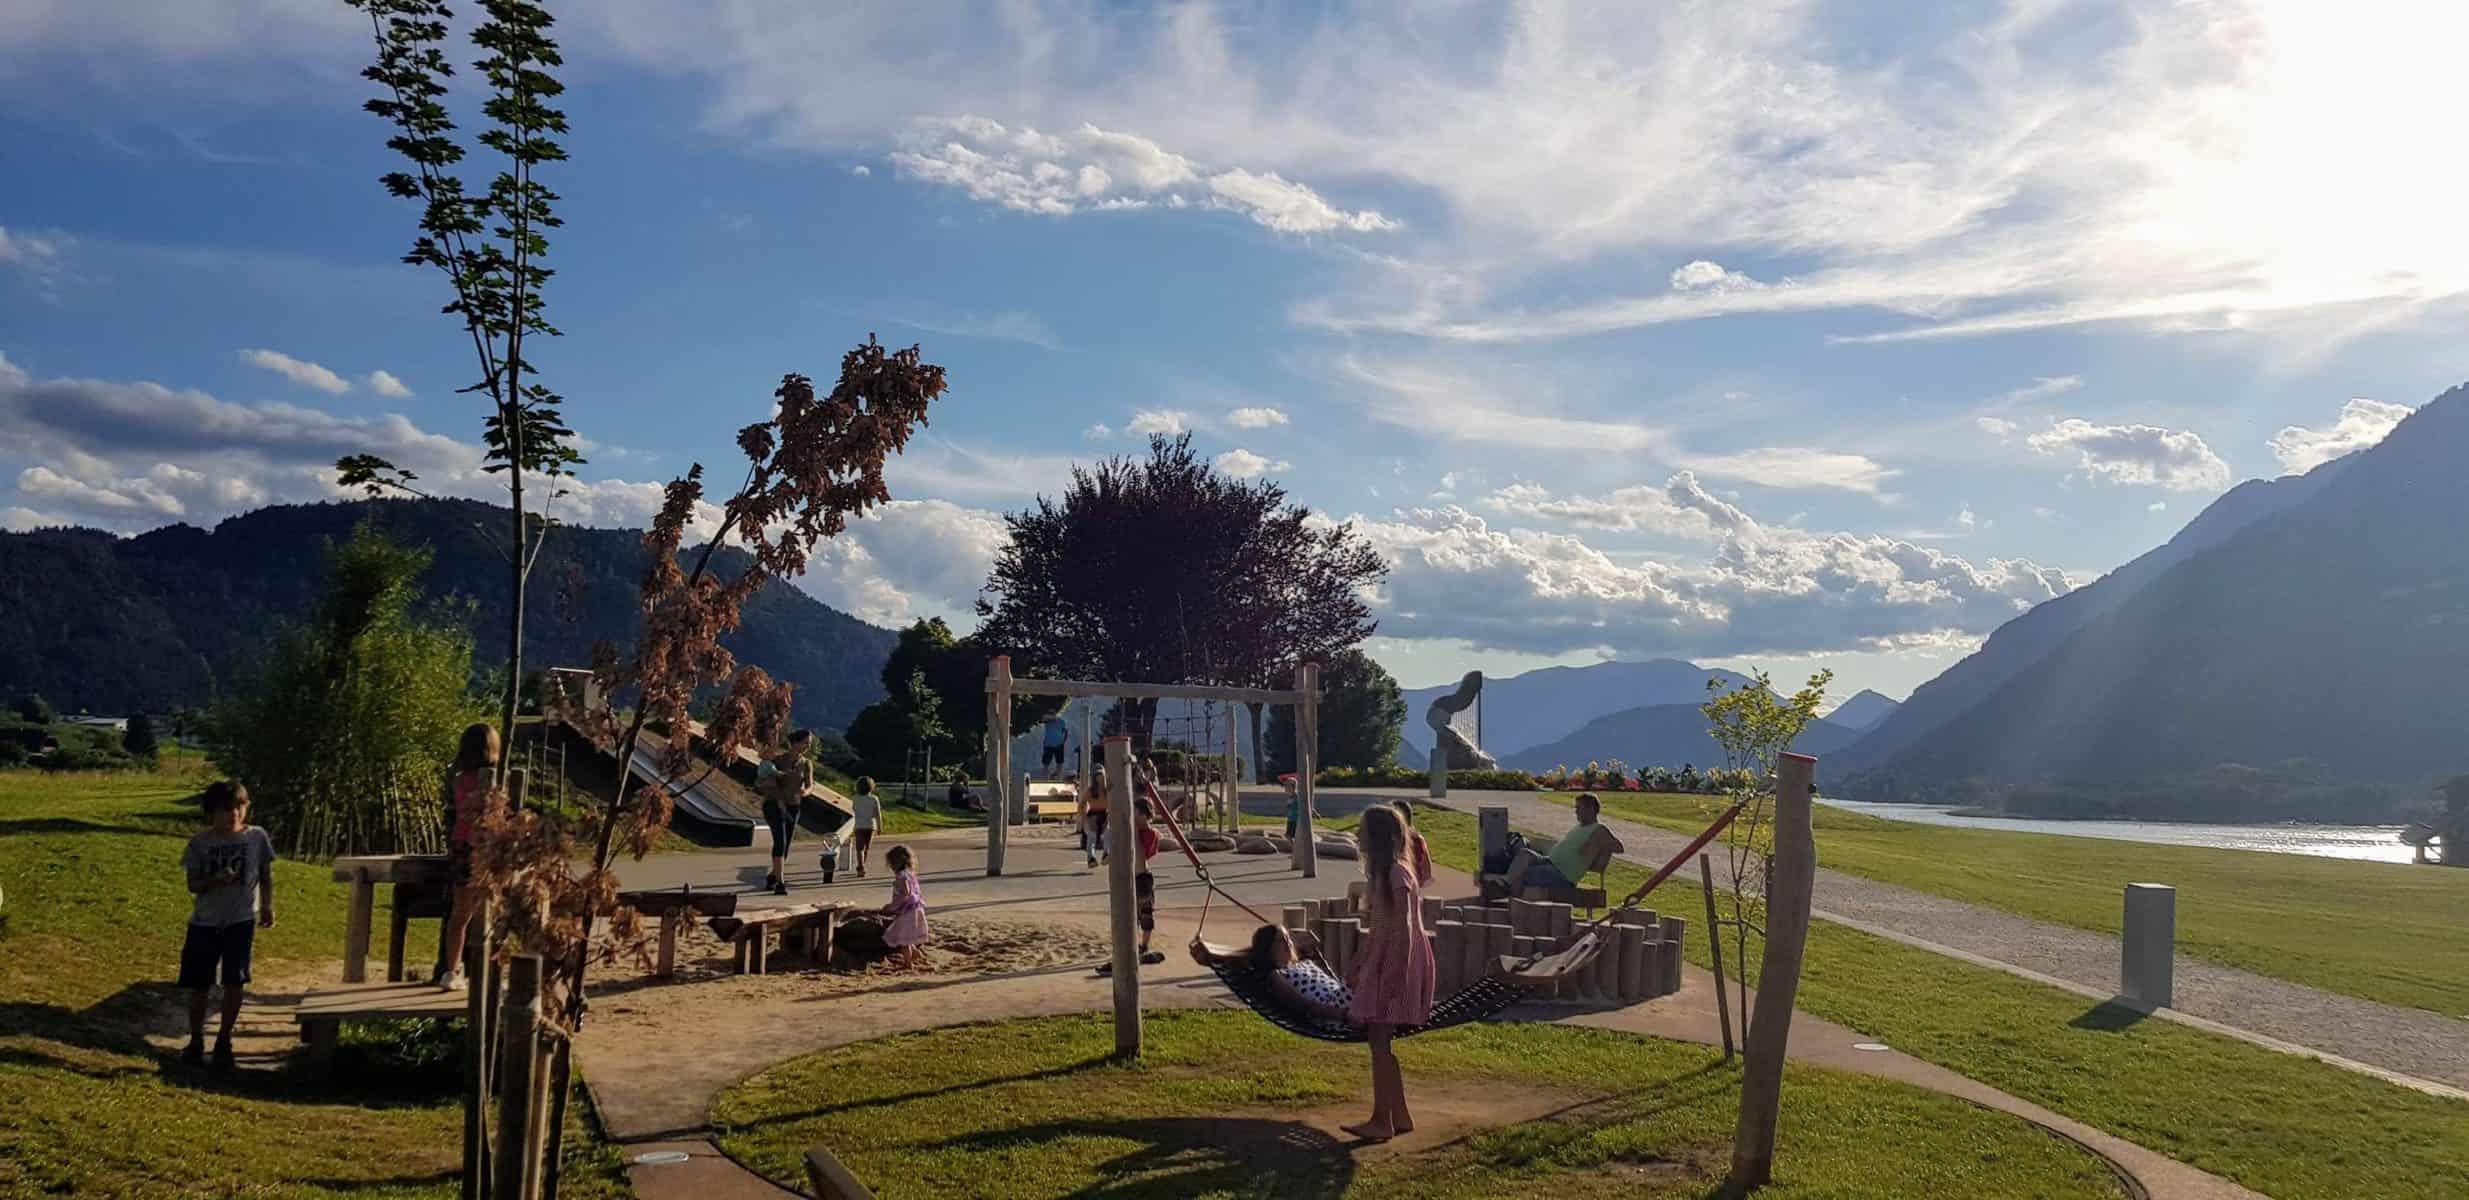 Kinderspielplatz in Kärnten am Ossiacher See